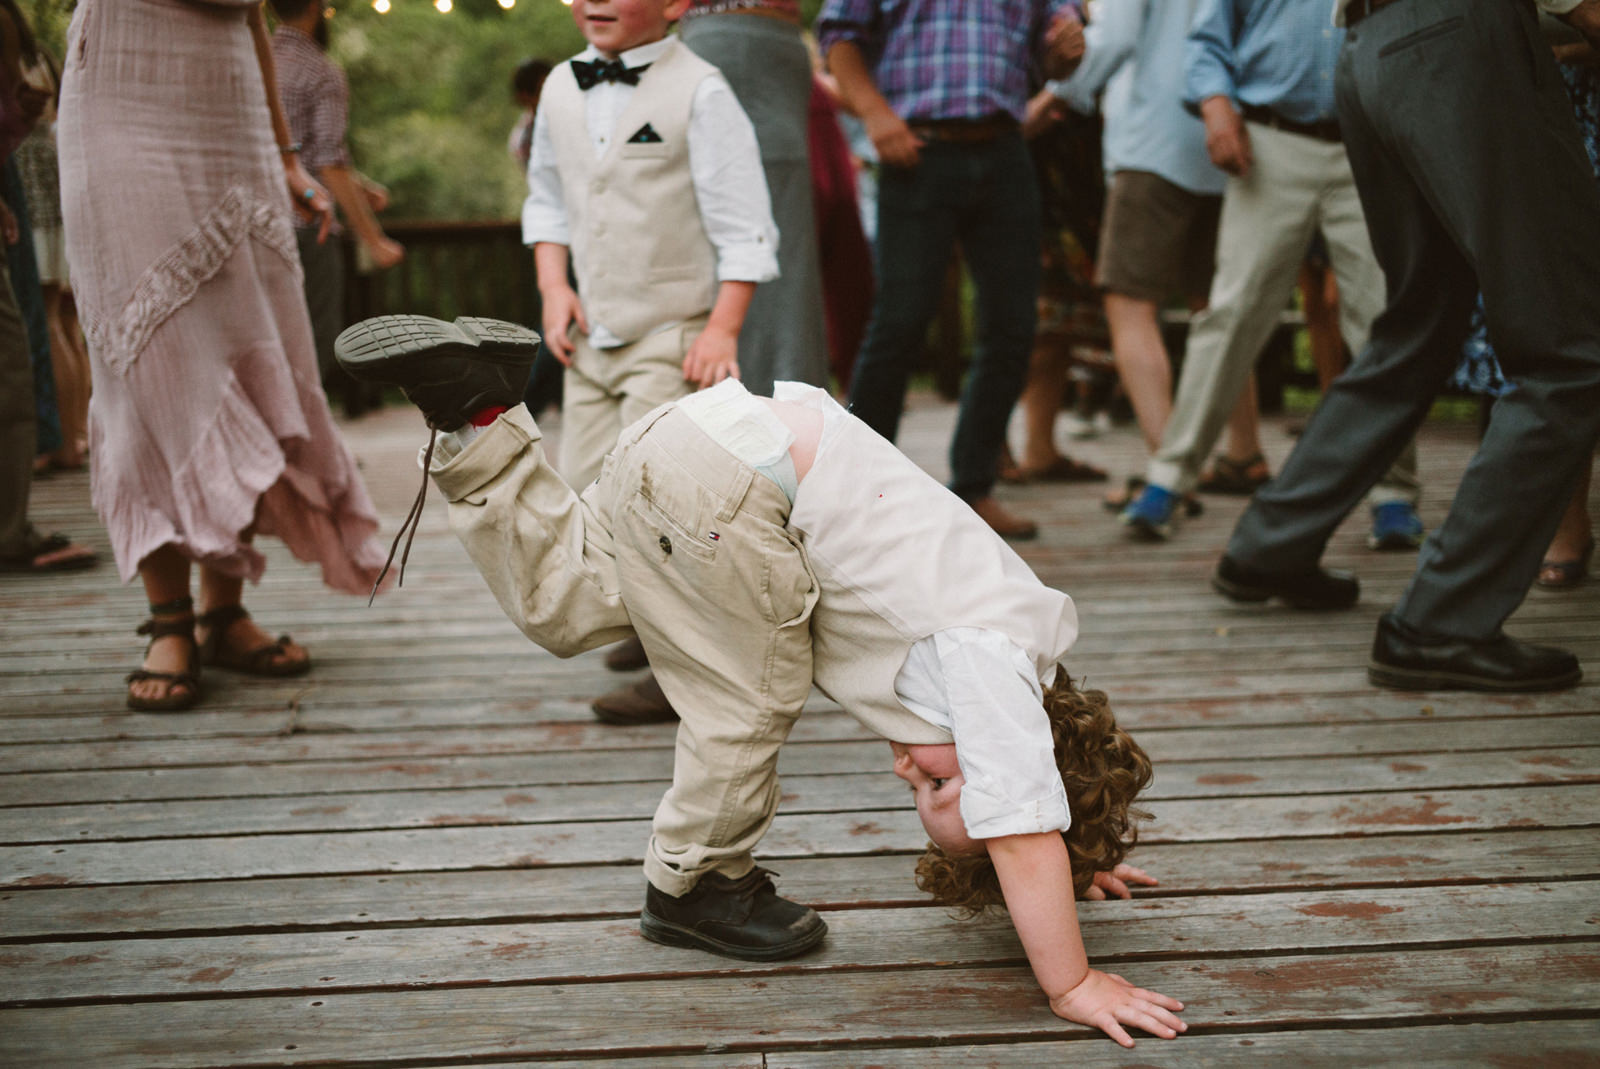 rivers-bend-retreat-wedding-107 RIVER'S BEND RETREAT WEDDING